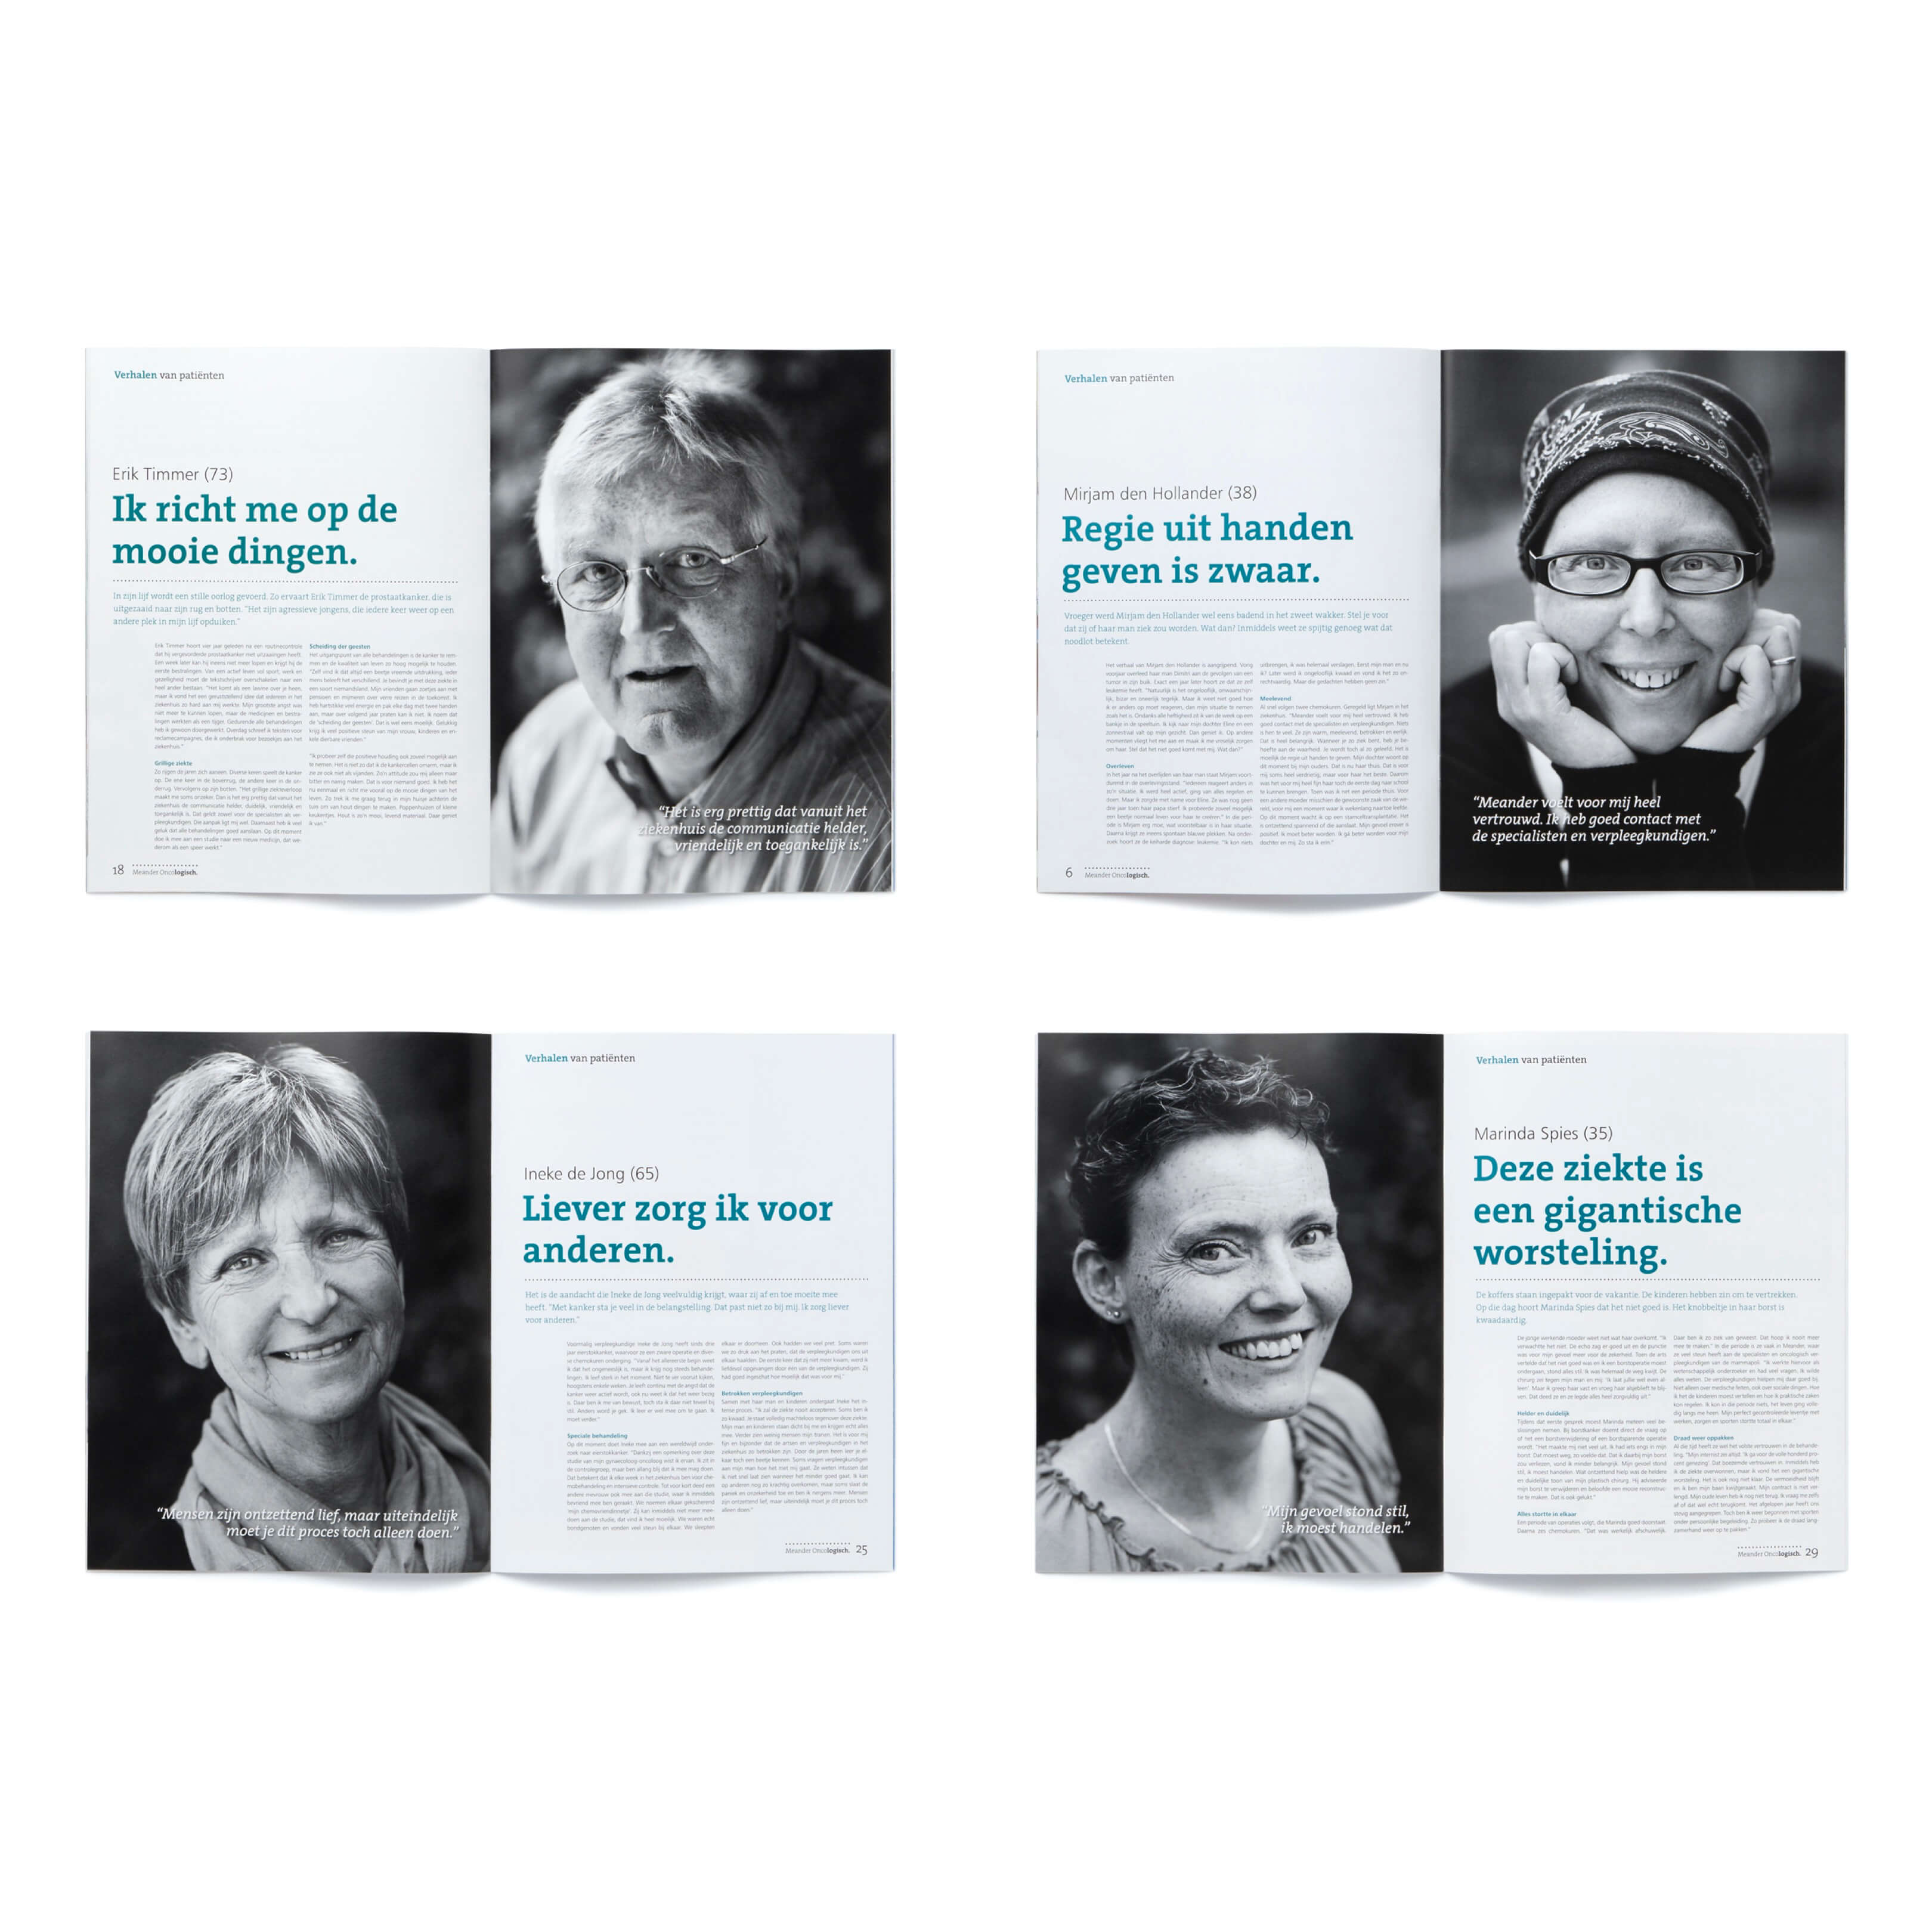 Jurjen Poeles Fotografie cover magazine Oncologisch Concreet Meander Medisch Centrum Amersfoort portret patient zwart wit